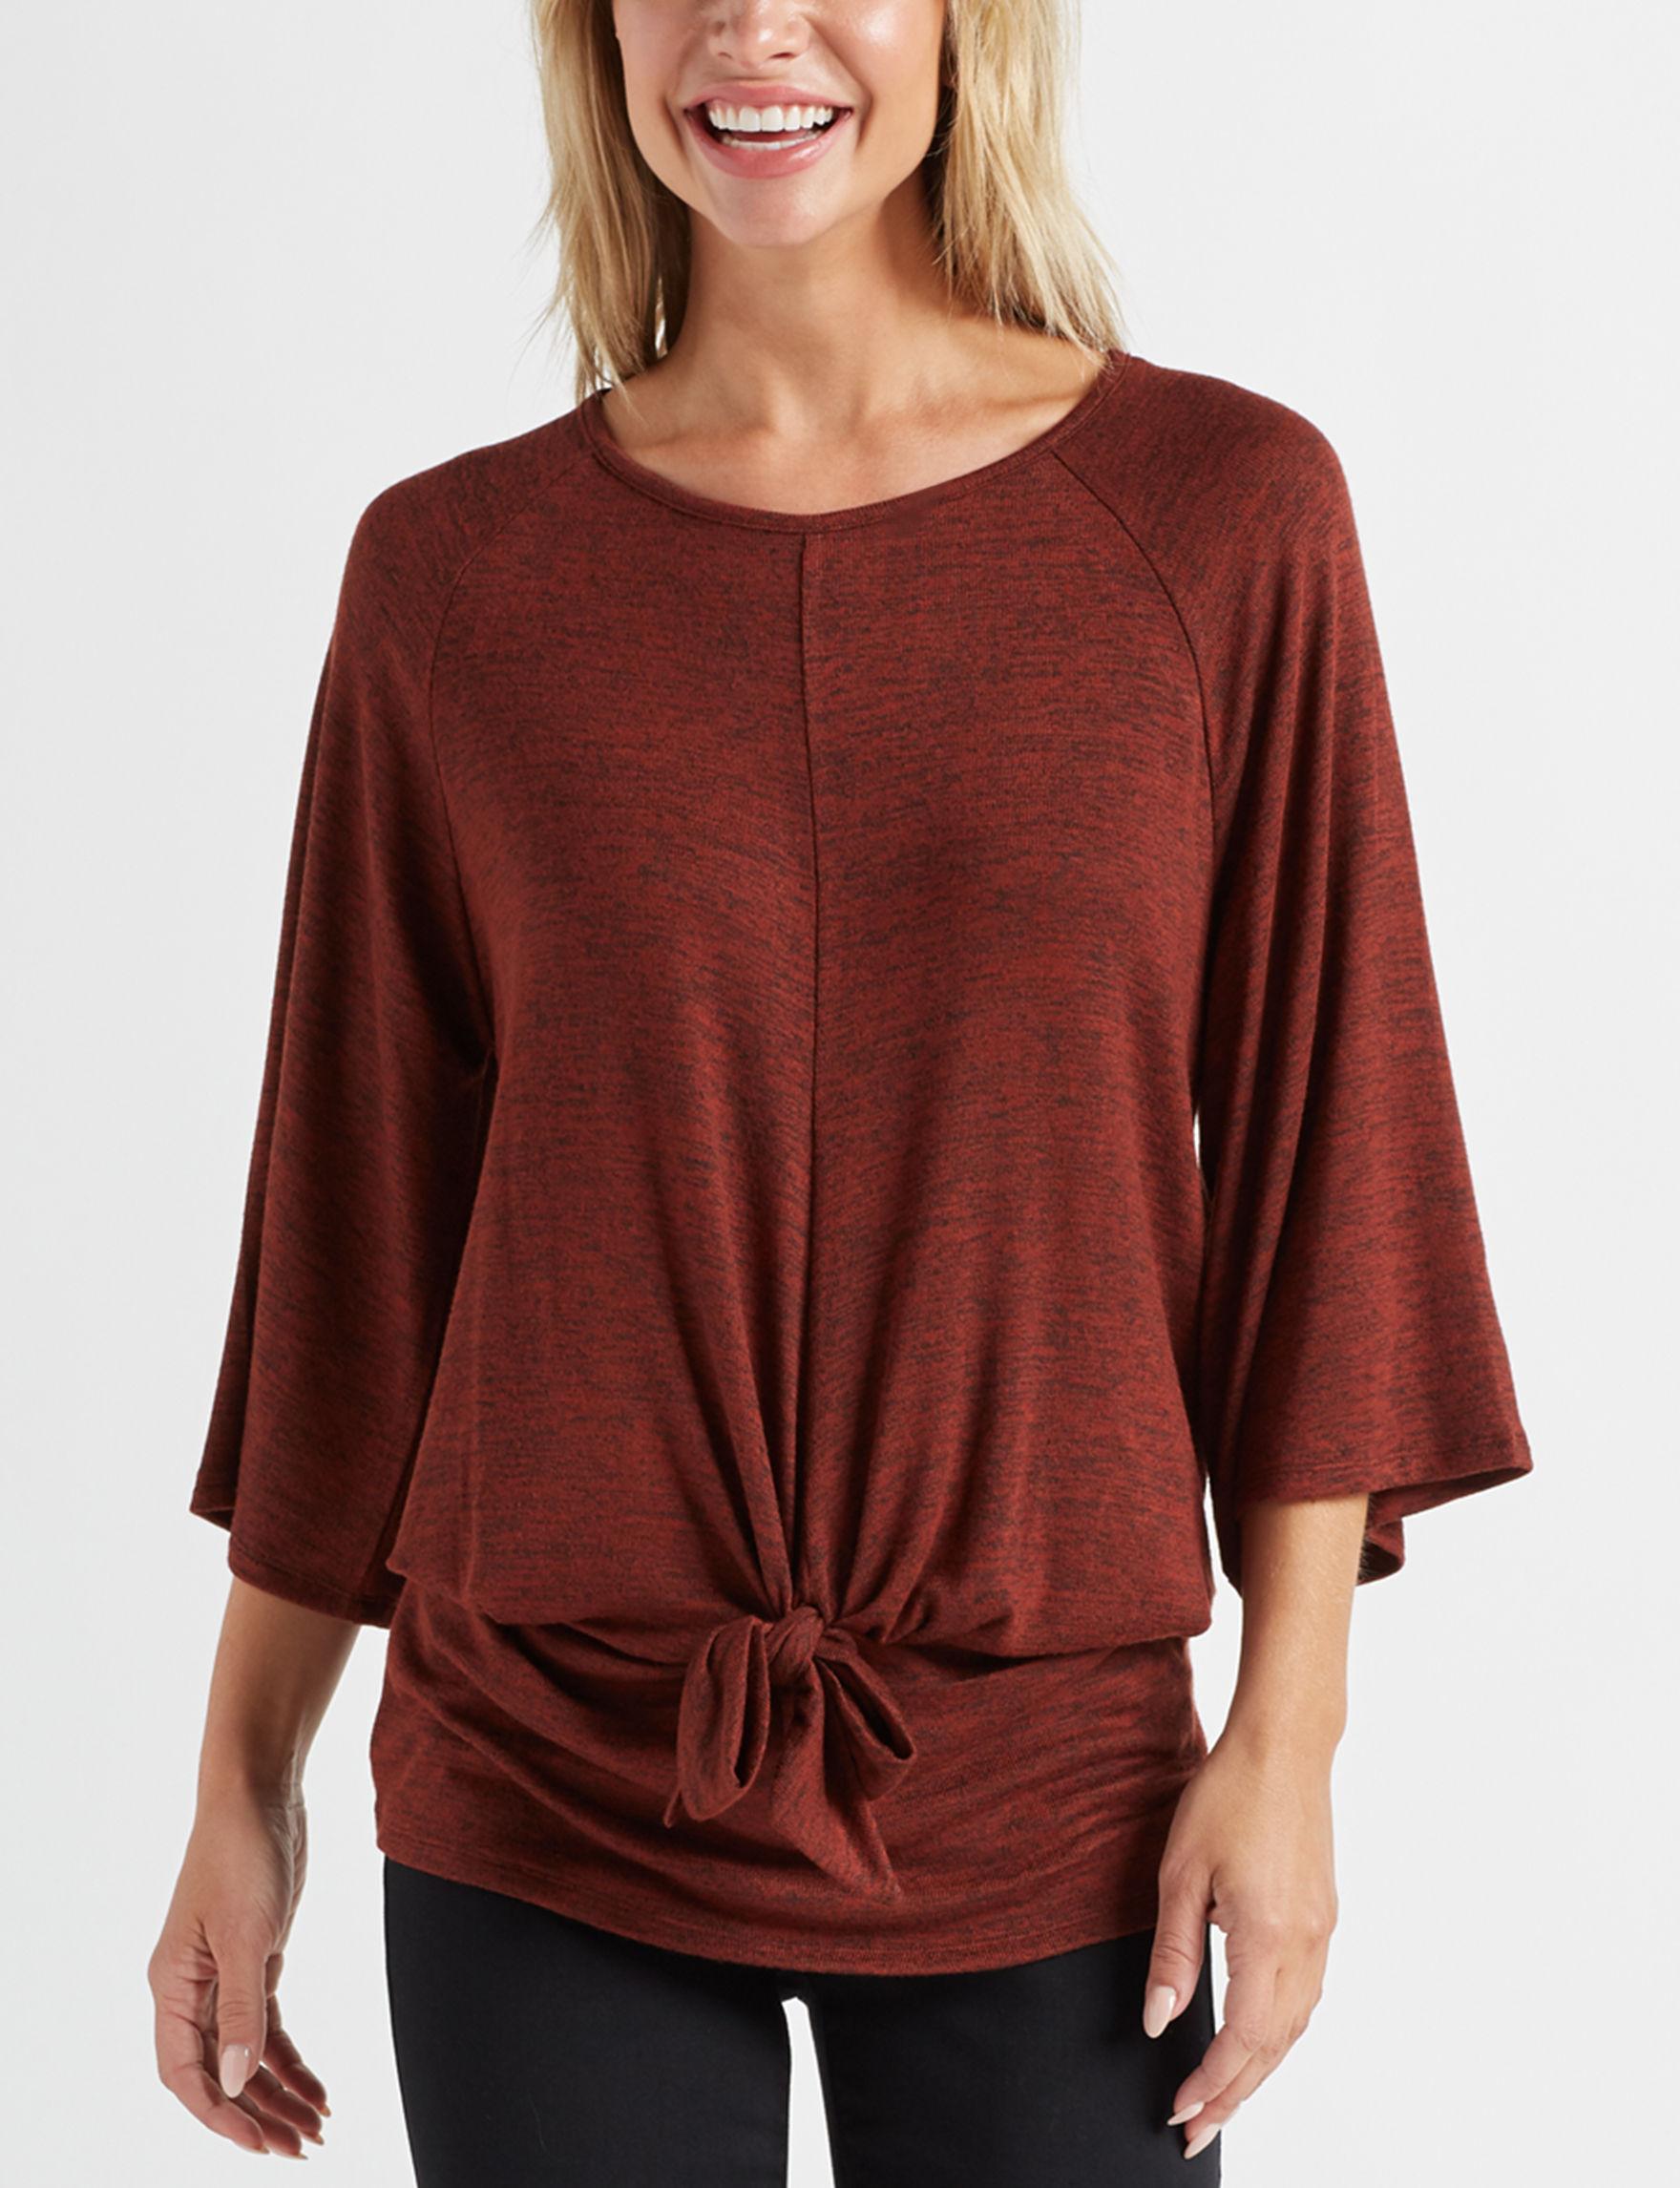 Olivia Blu Burgundy Shirts & Blouses